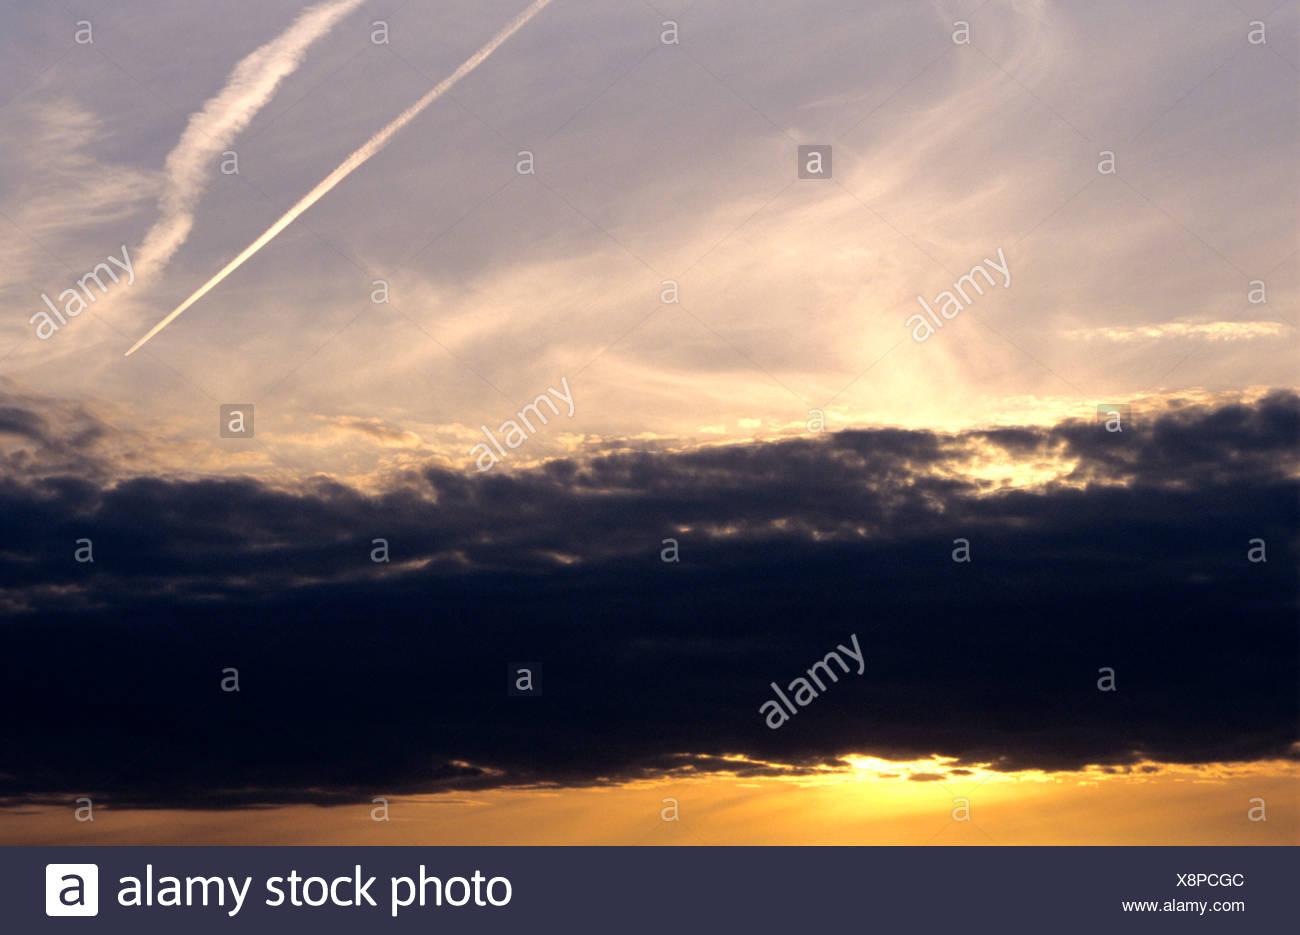 Light phenomena in an evening sky - Stock Image